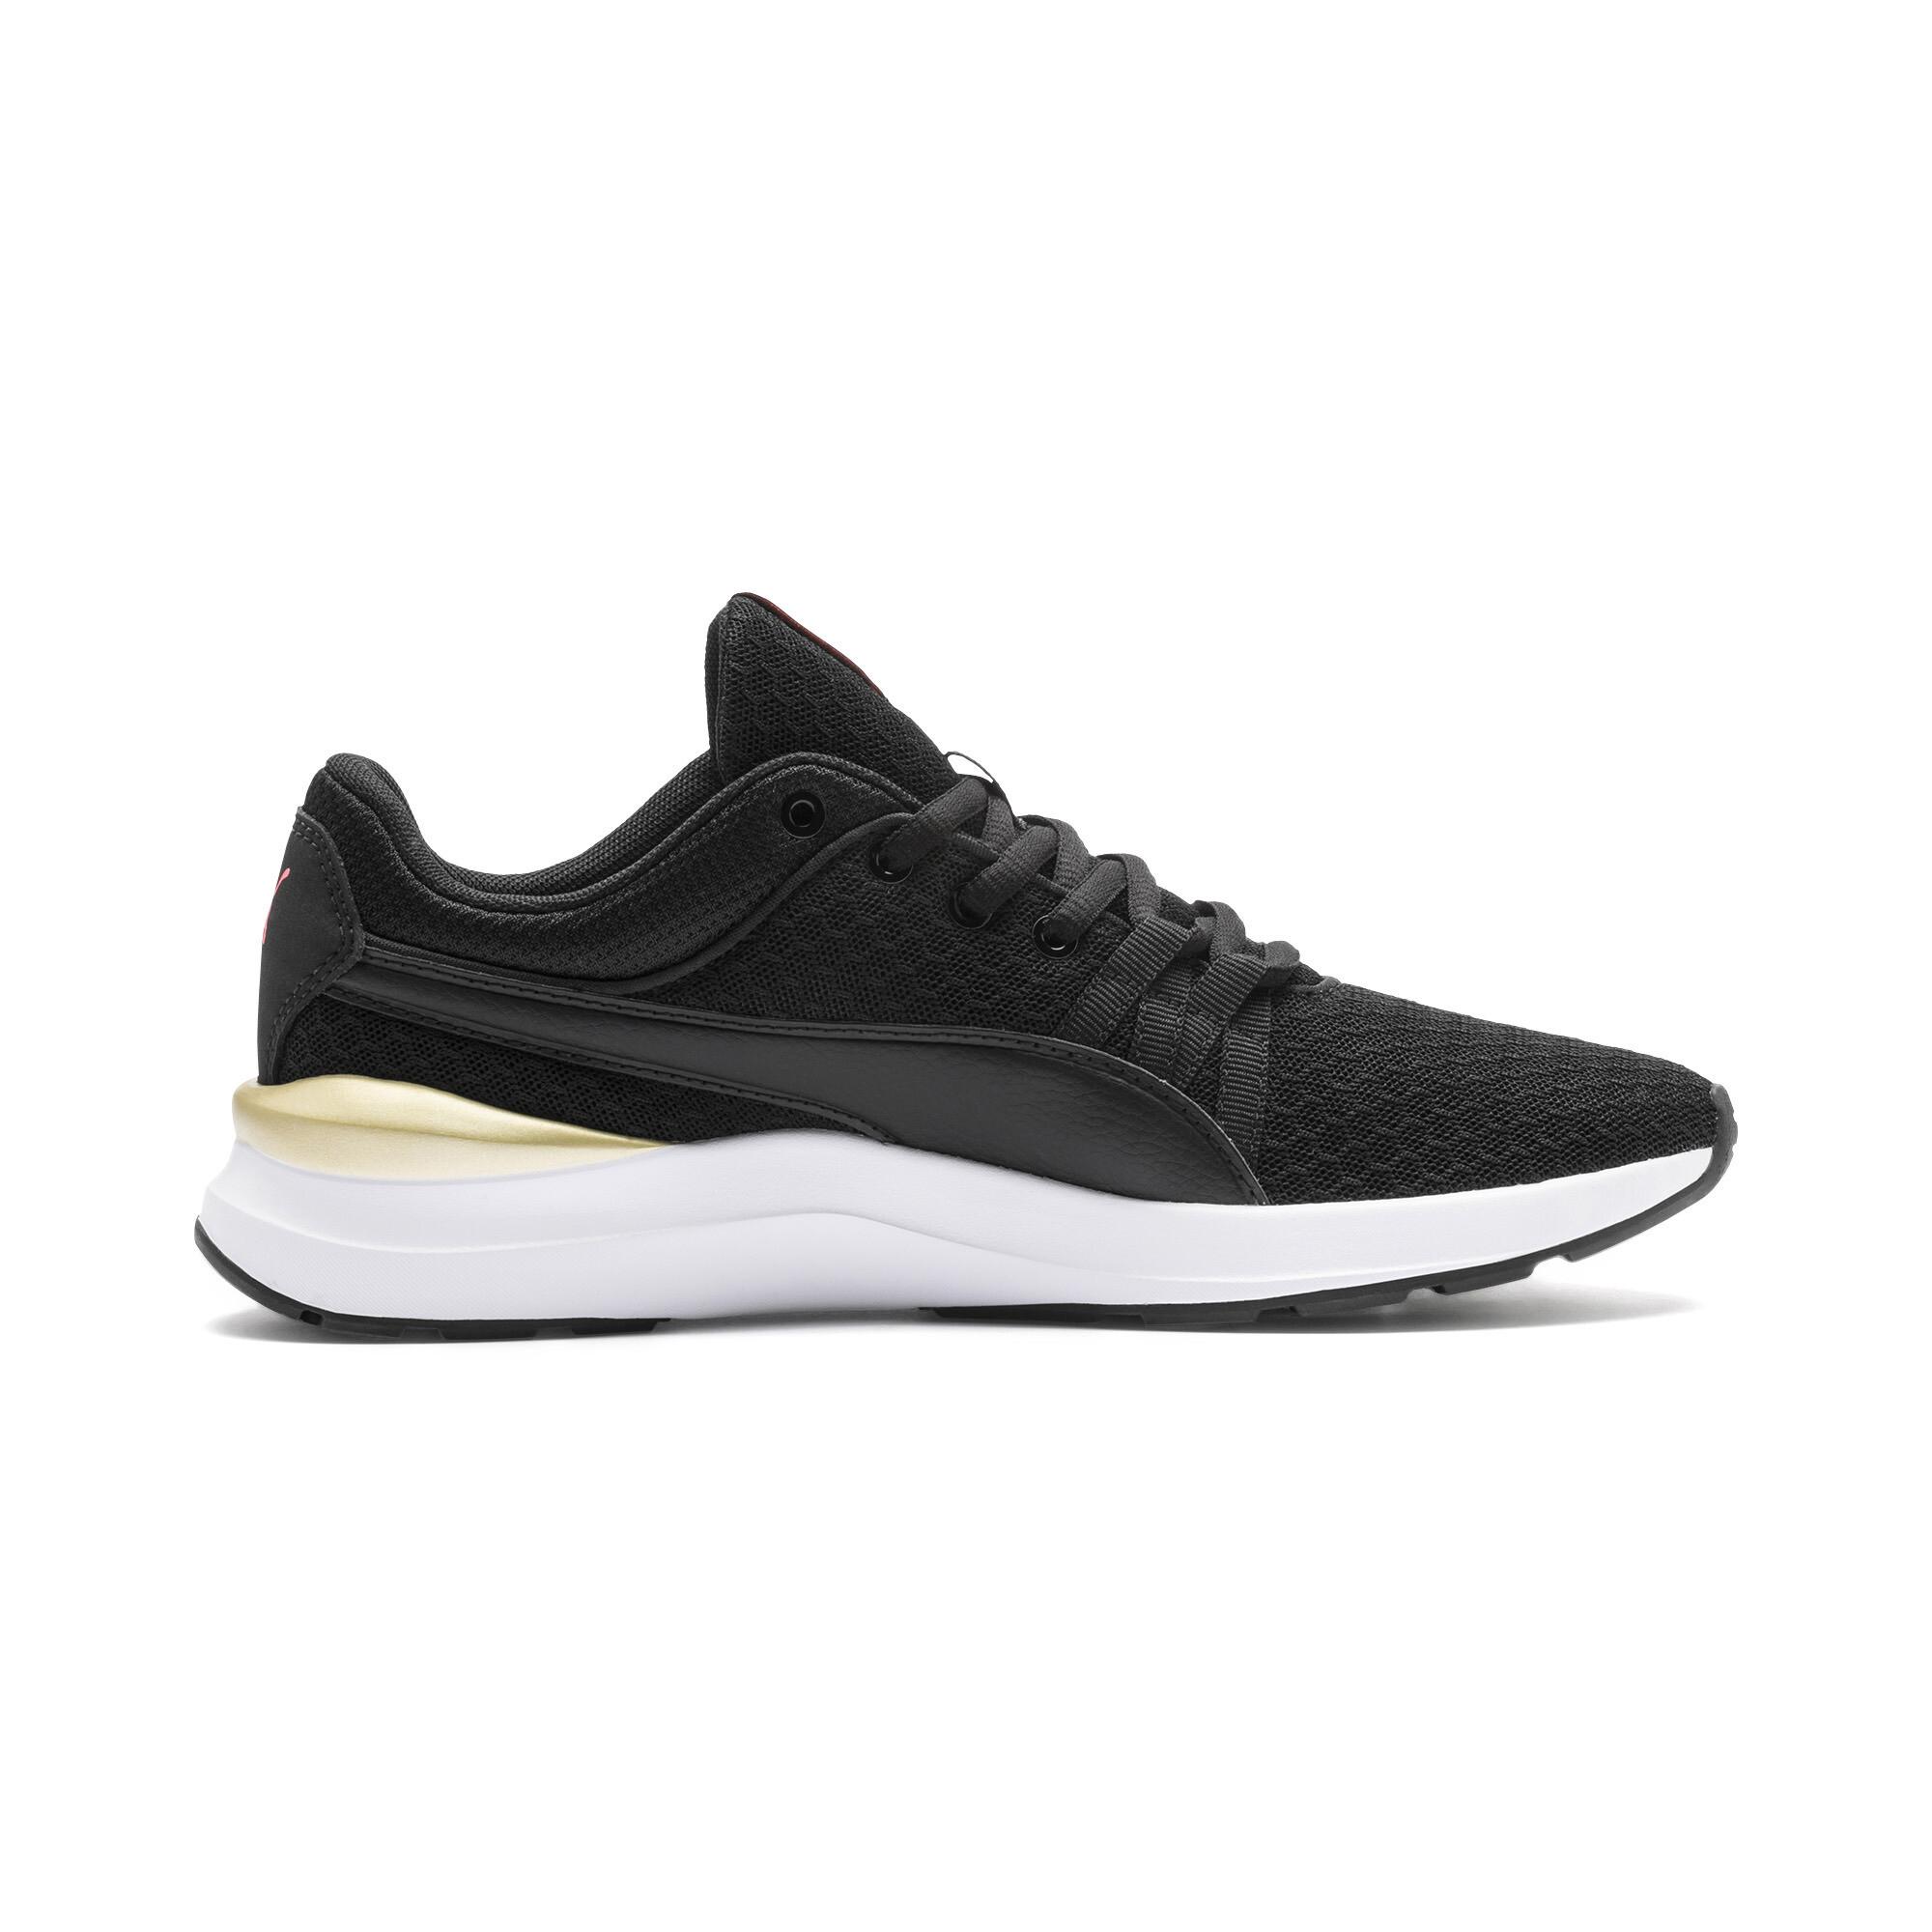 PUMA-Adela-Core-Women-s-Sneakers-Women-Shoe-Basics thumbnail 7